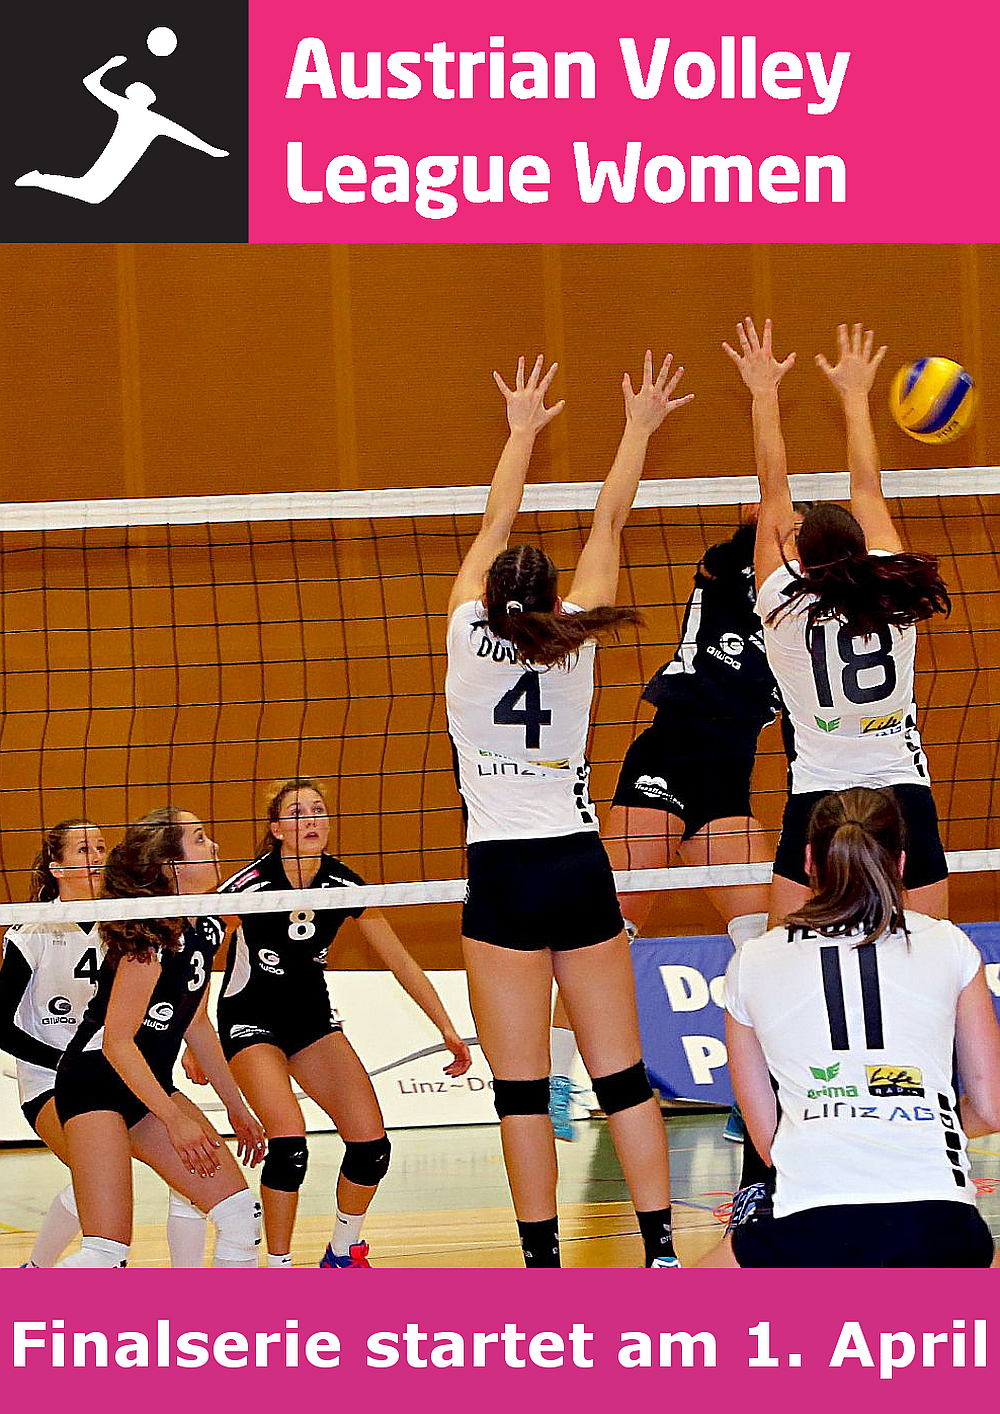 Austrian Volley League Women - FOTO © Photo Plohe